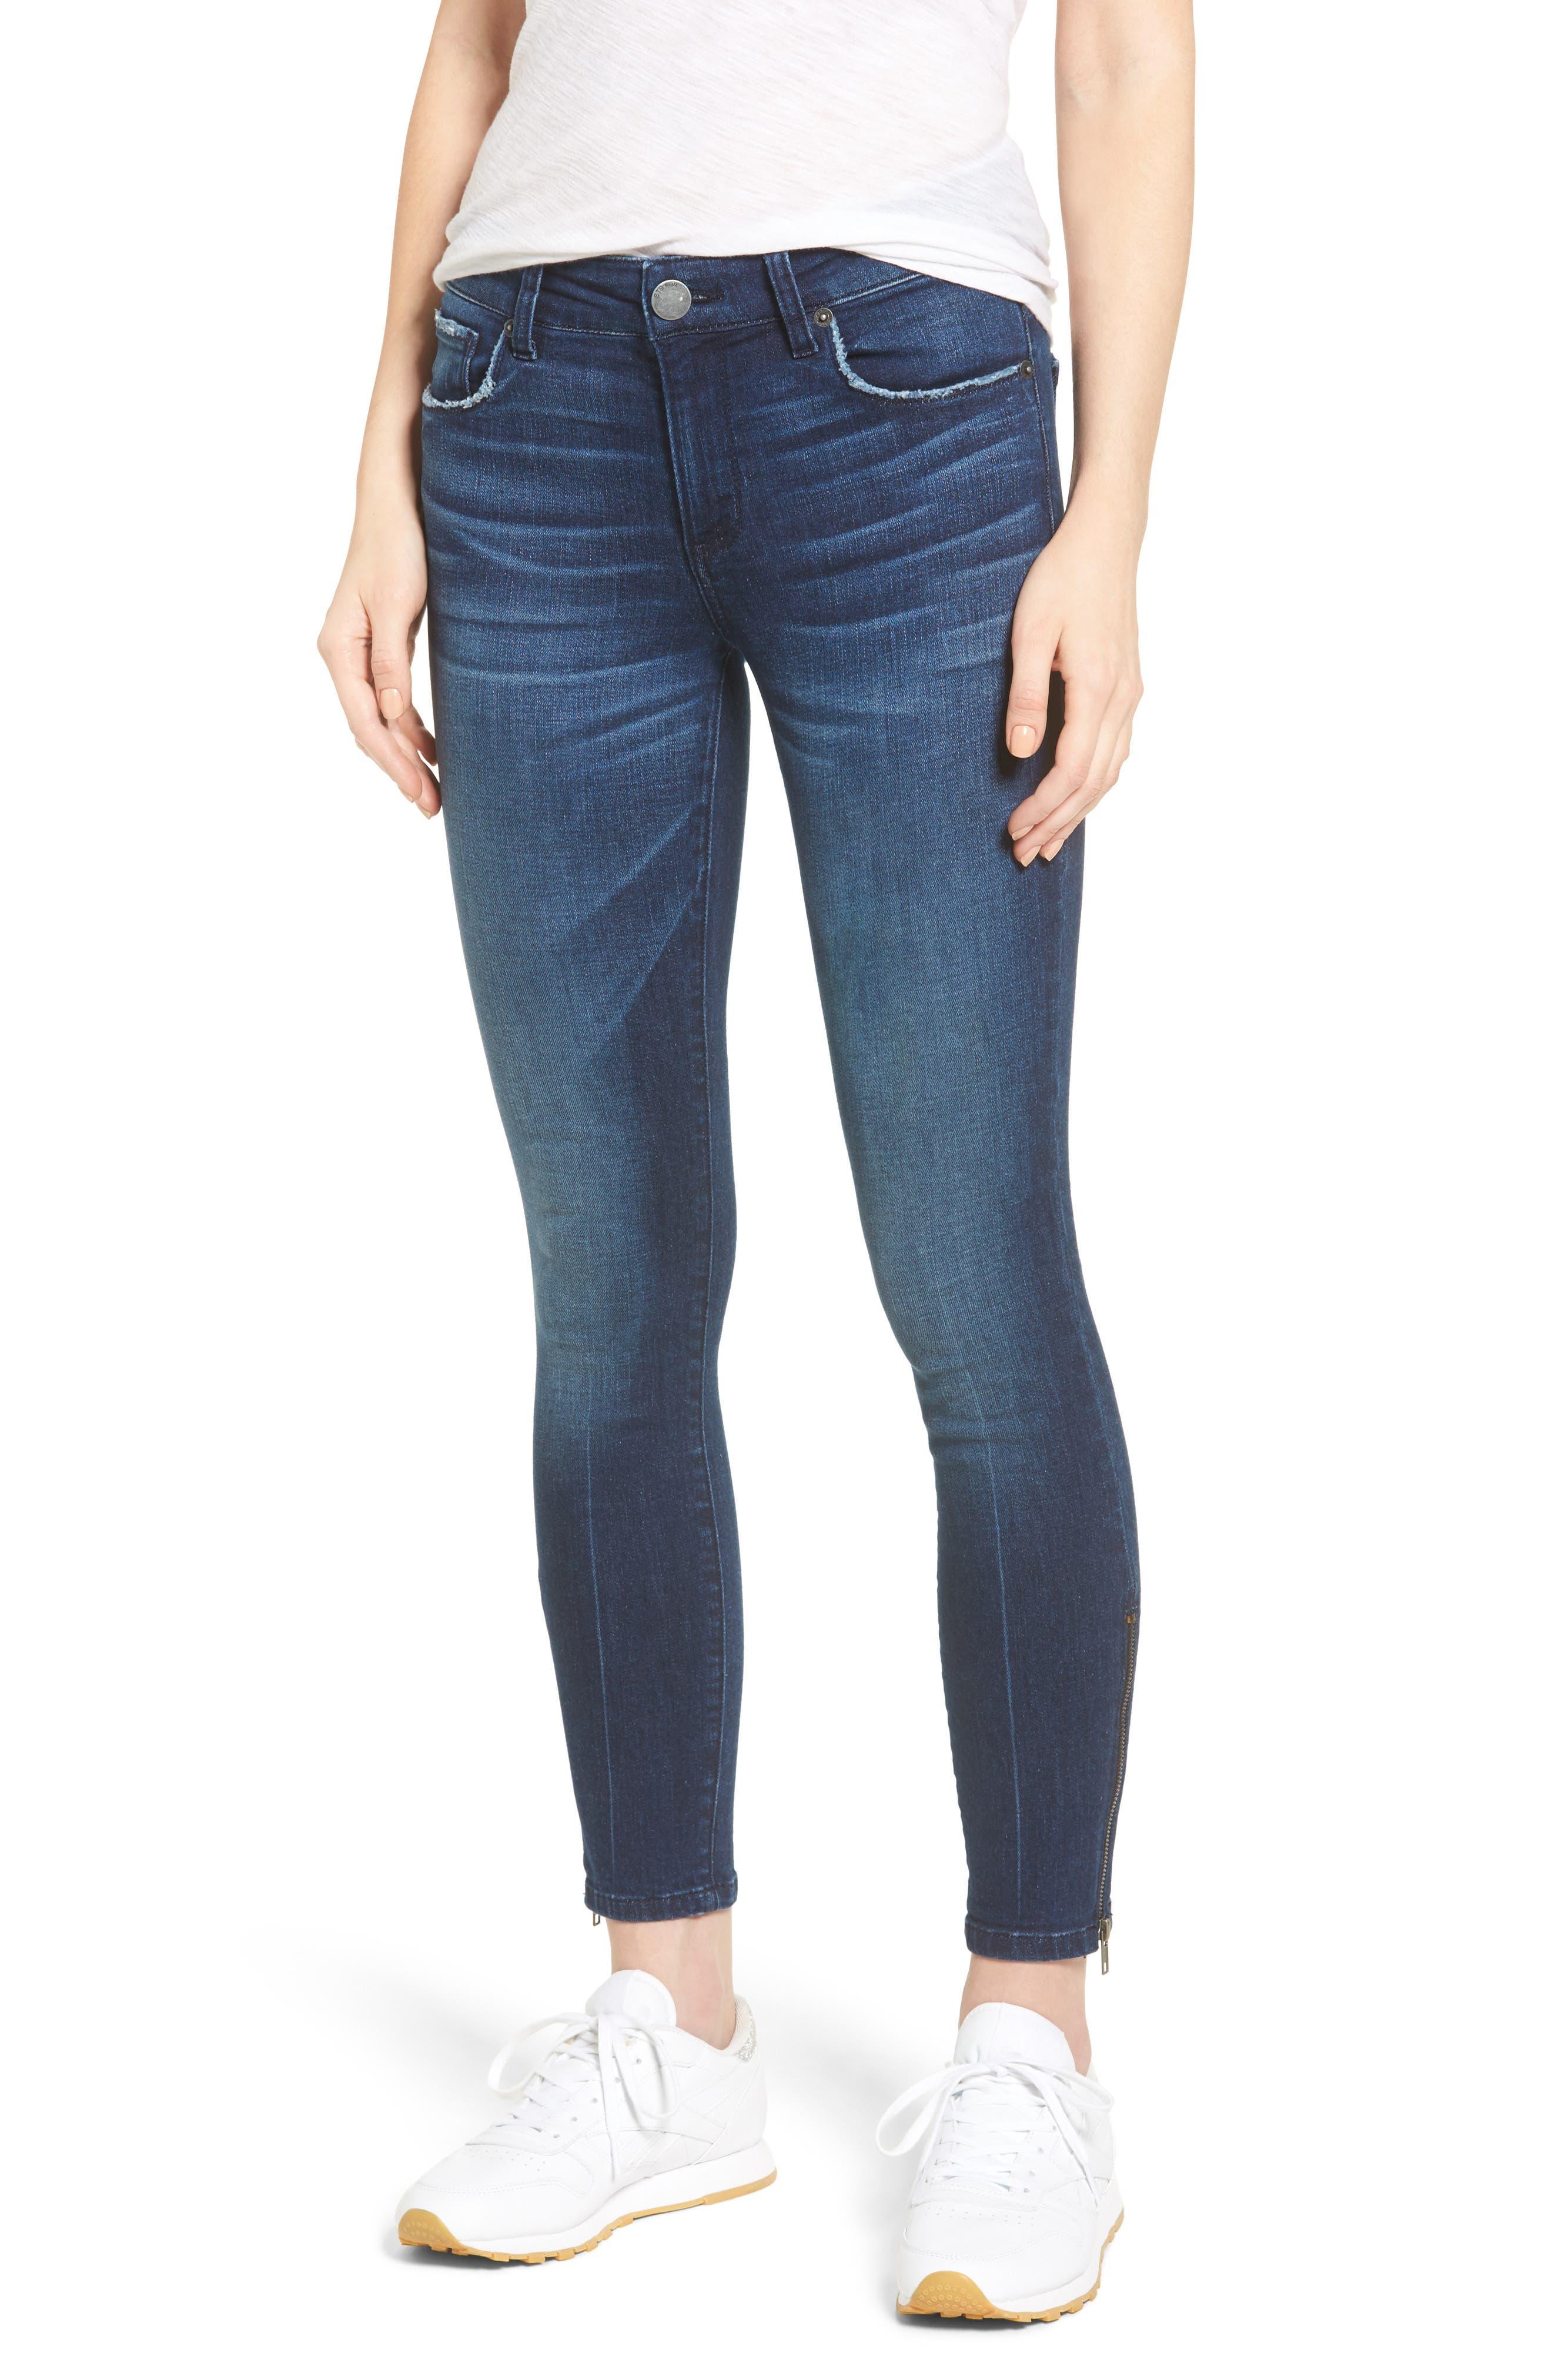 Alternate Image 1 Selected - STS Blue Emma Ankle Zip Skinny Jeans (Groveland)